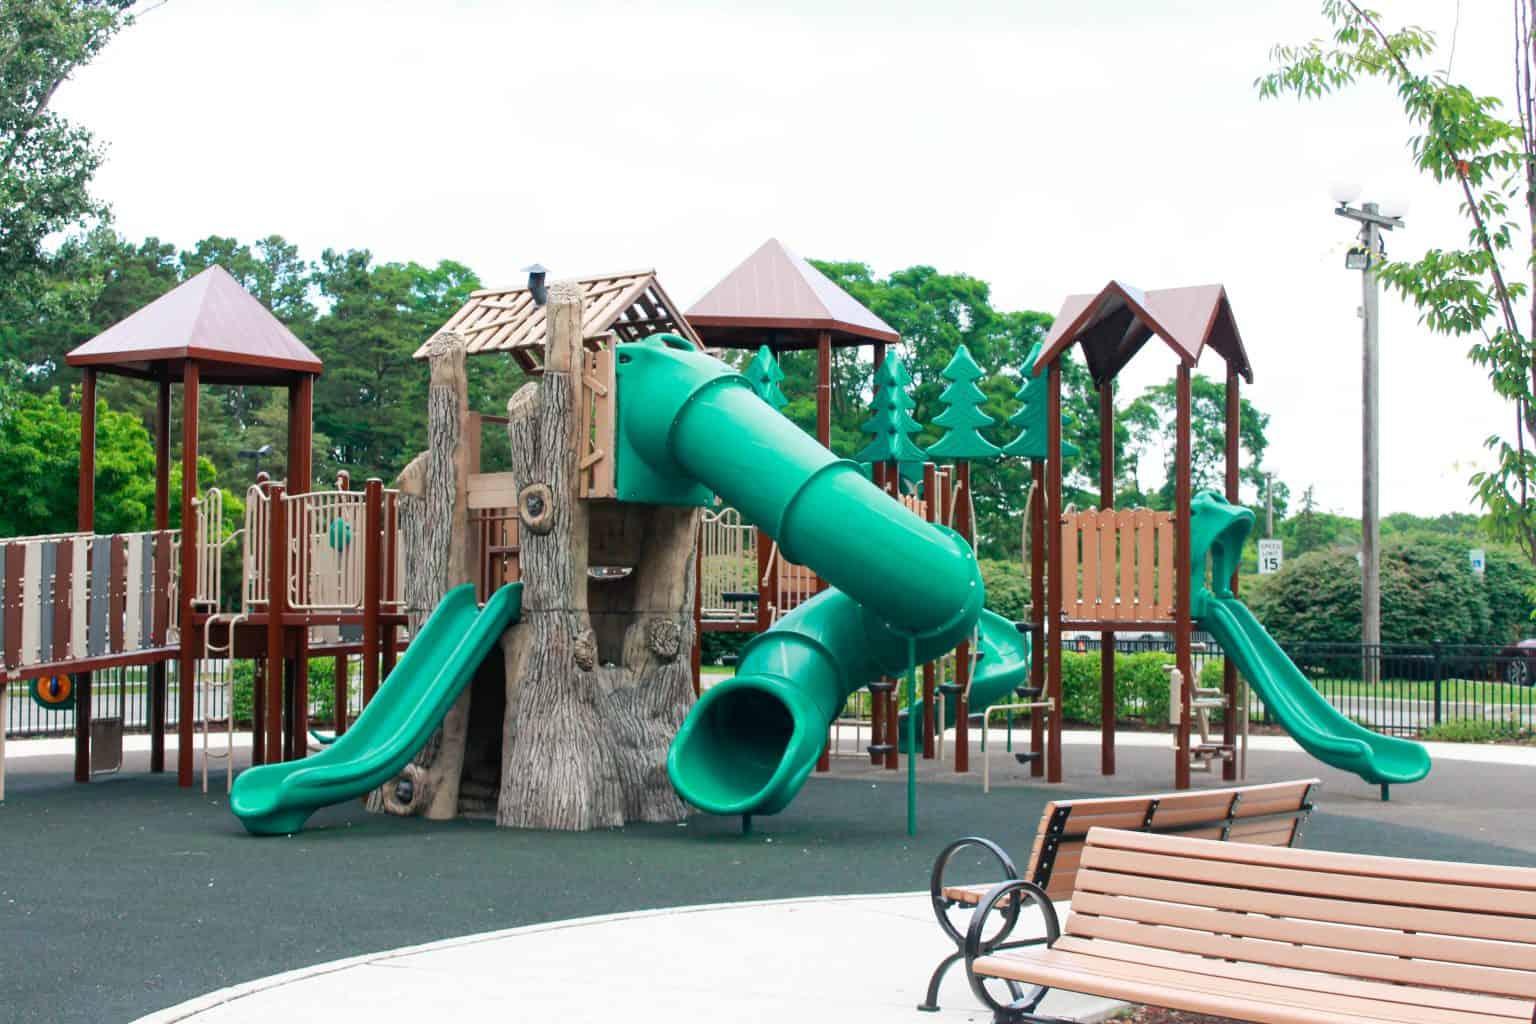 windward-beach-park-playground-brick-nj_28266703175_o-1-1536x1024